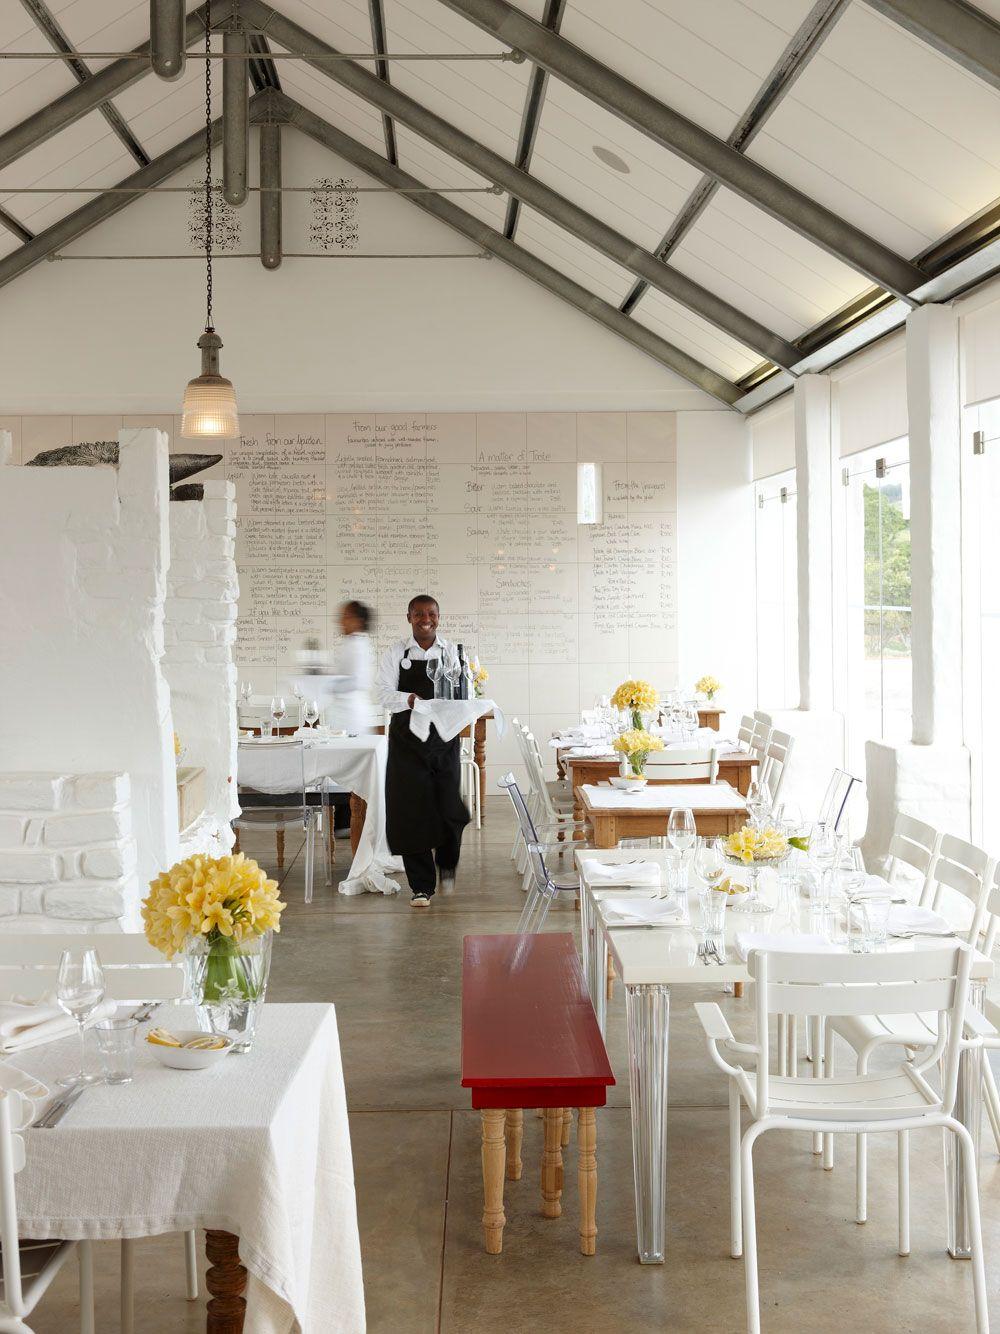 Pin By Kelly Conkright On Favorite Restaurants Restaurant